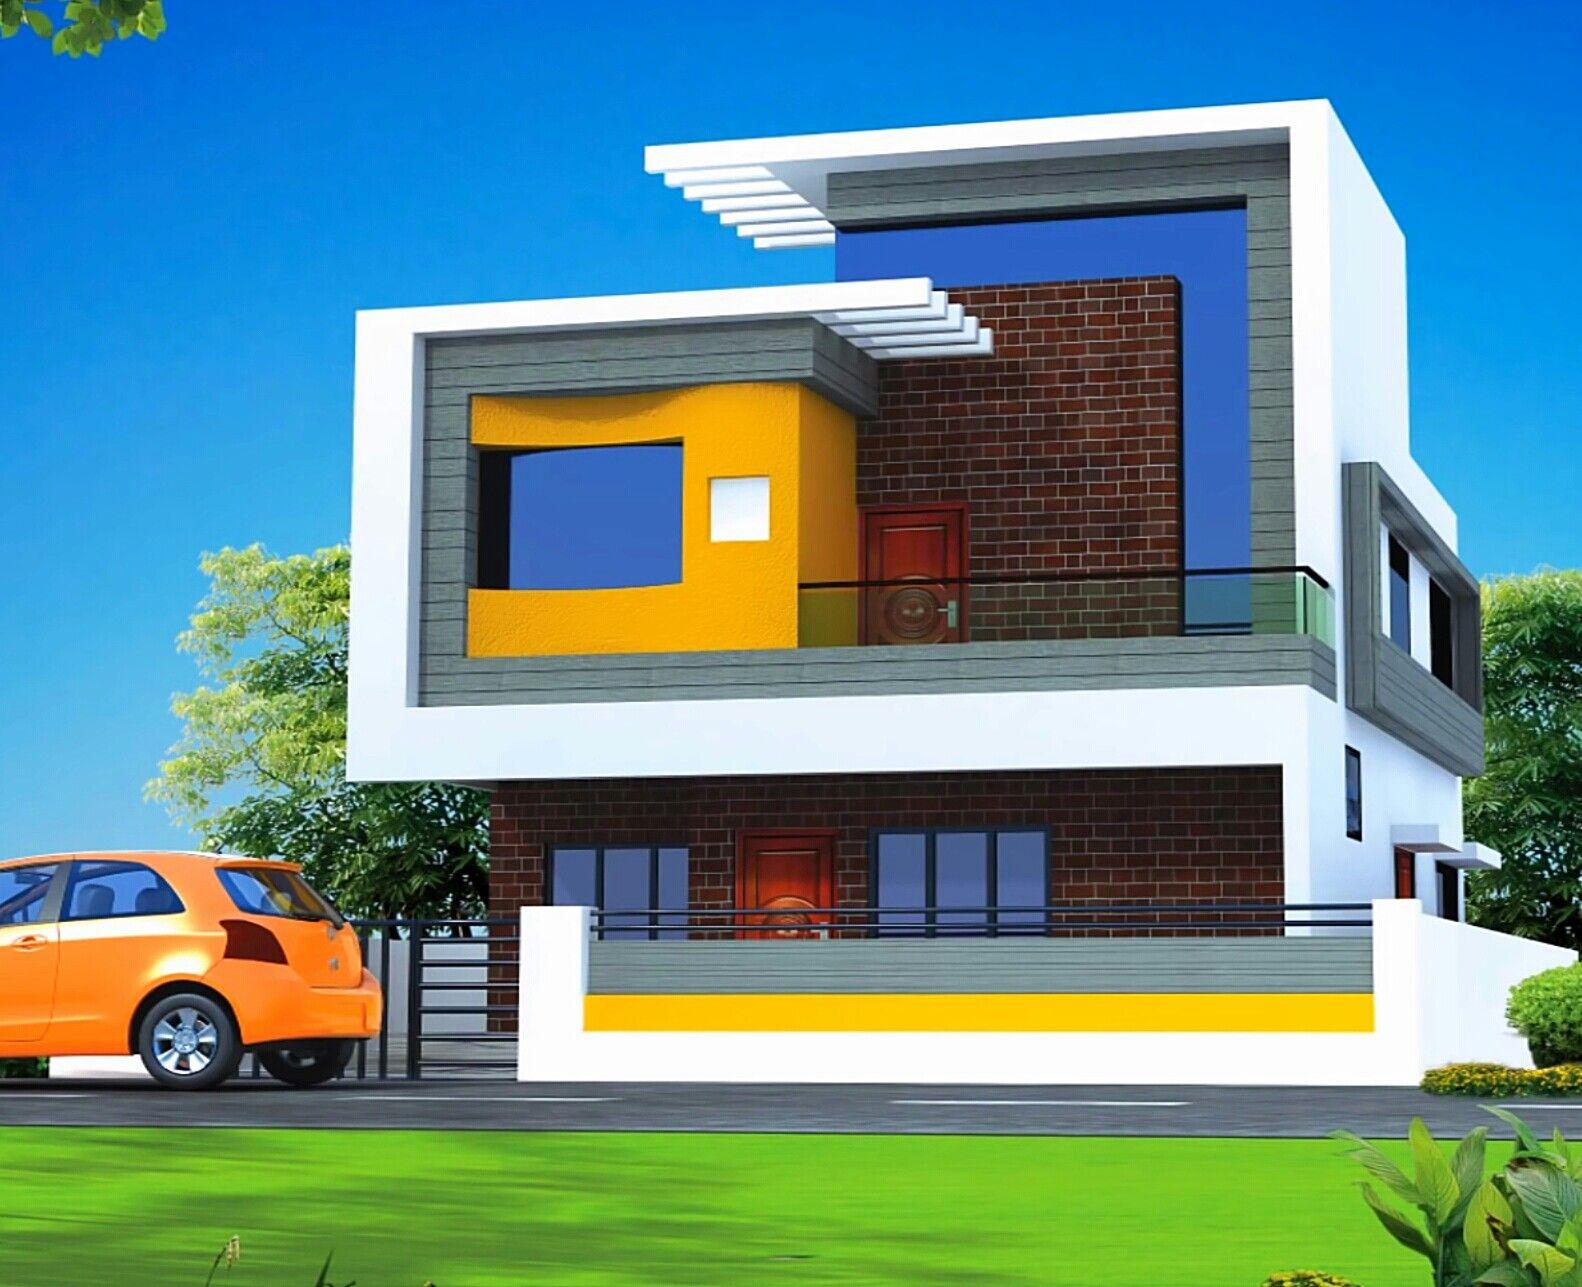 Pin by sandeep borchate bb on bunglows casas casas - Decoraciones de casas modernas ...